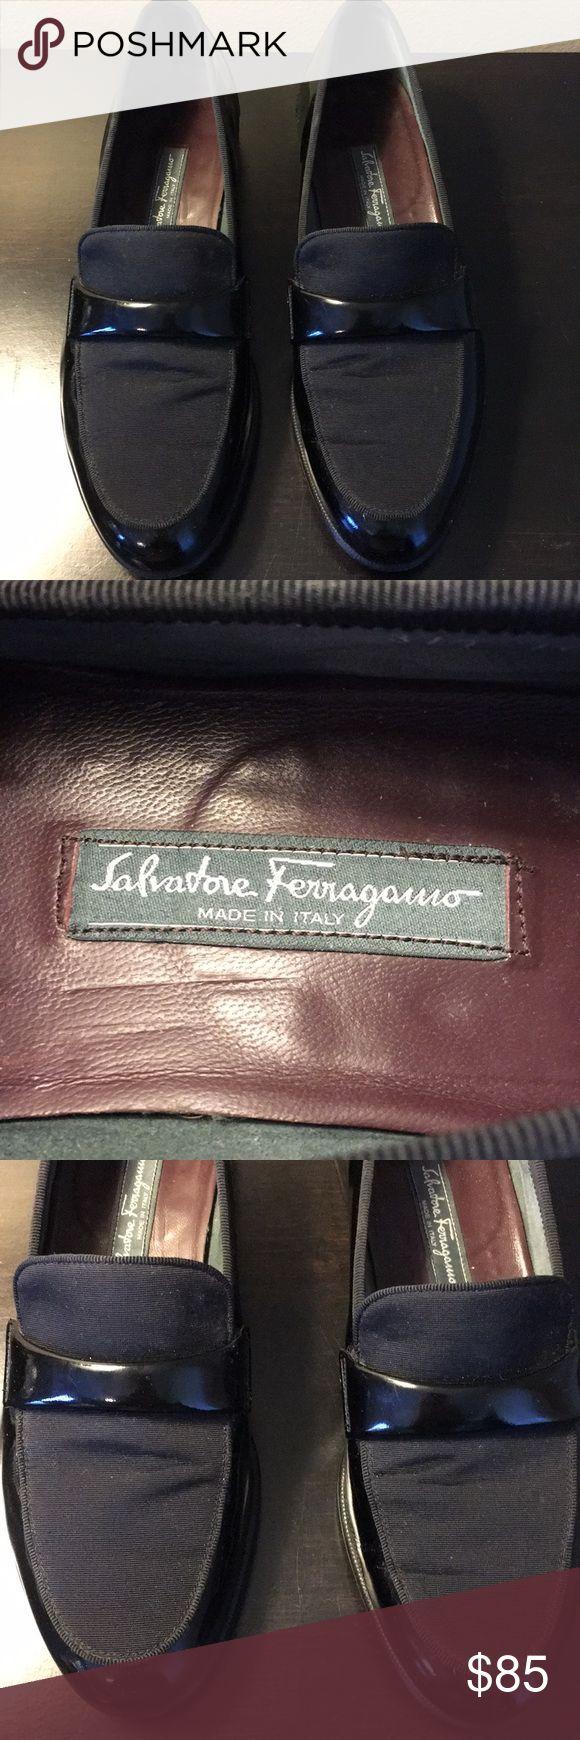 Salvatore Ferragamo Tuxedo Slip On Size 10 Salvatore Ferragamo Tuxedo Slip On Size 10 Salvatore Ferragamo Shoes Loafers & Slip-Ons